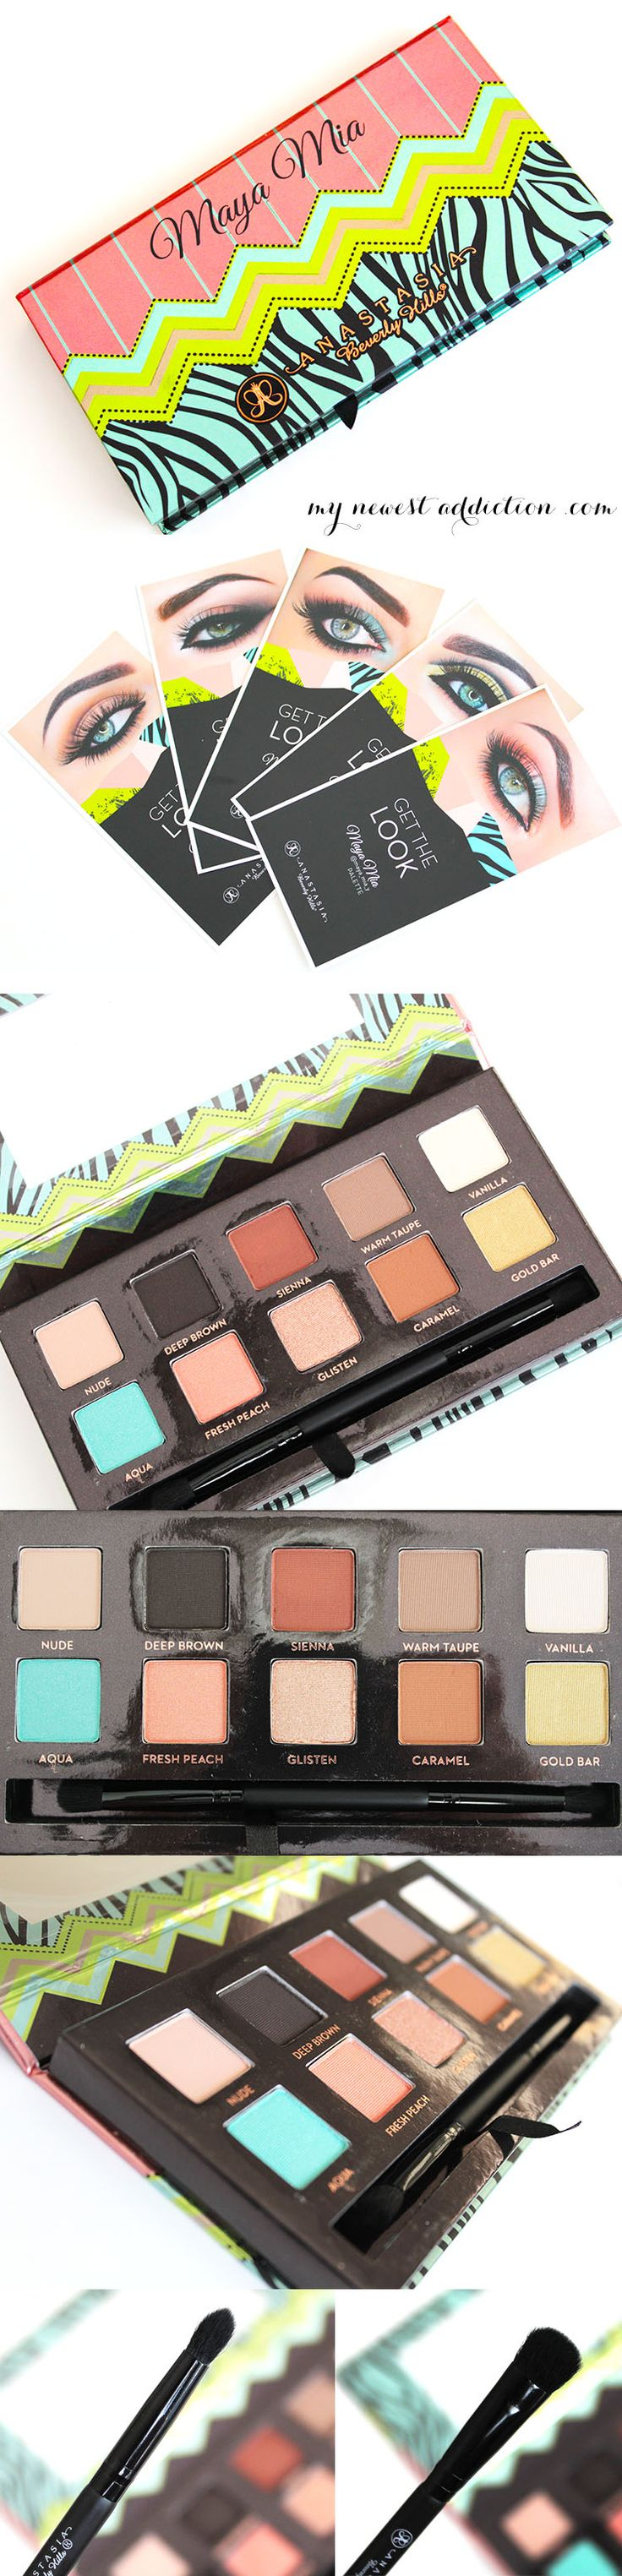 Anastasia Beverly Hills Maya Mia Palette #MakeupWars - www.mynewestaddiction.com